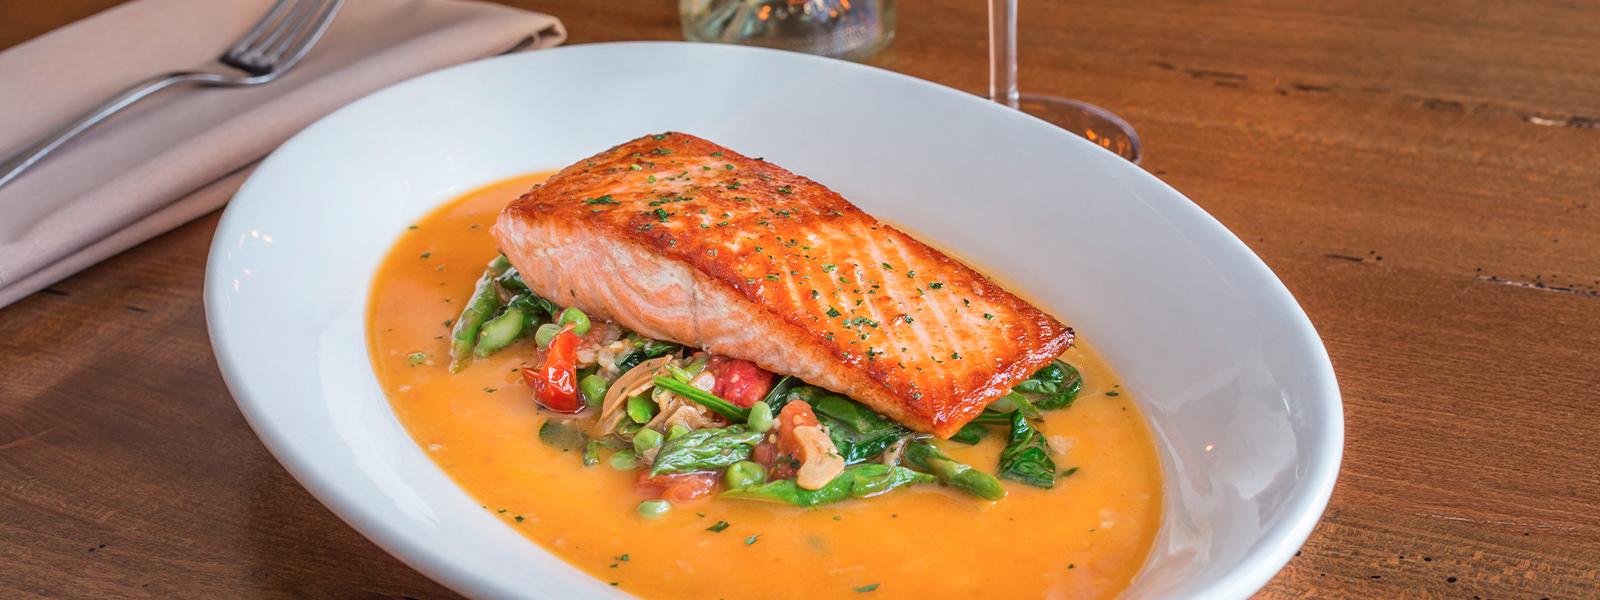 Salmon on dish with garnish